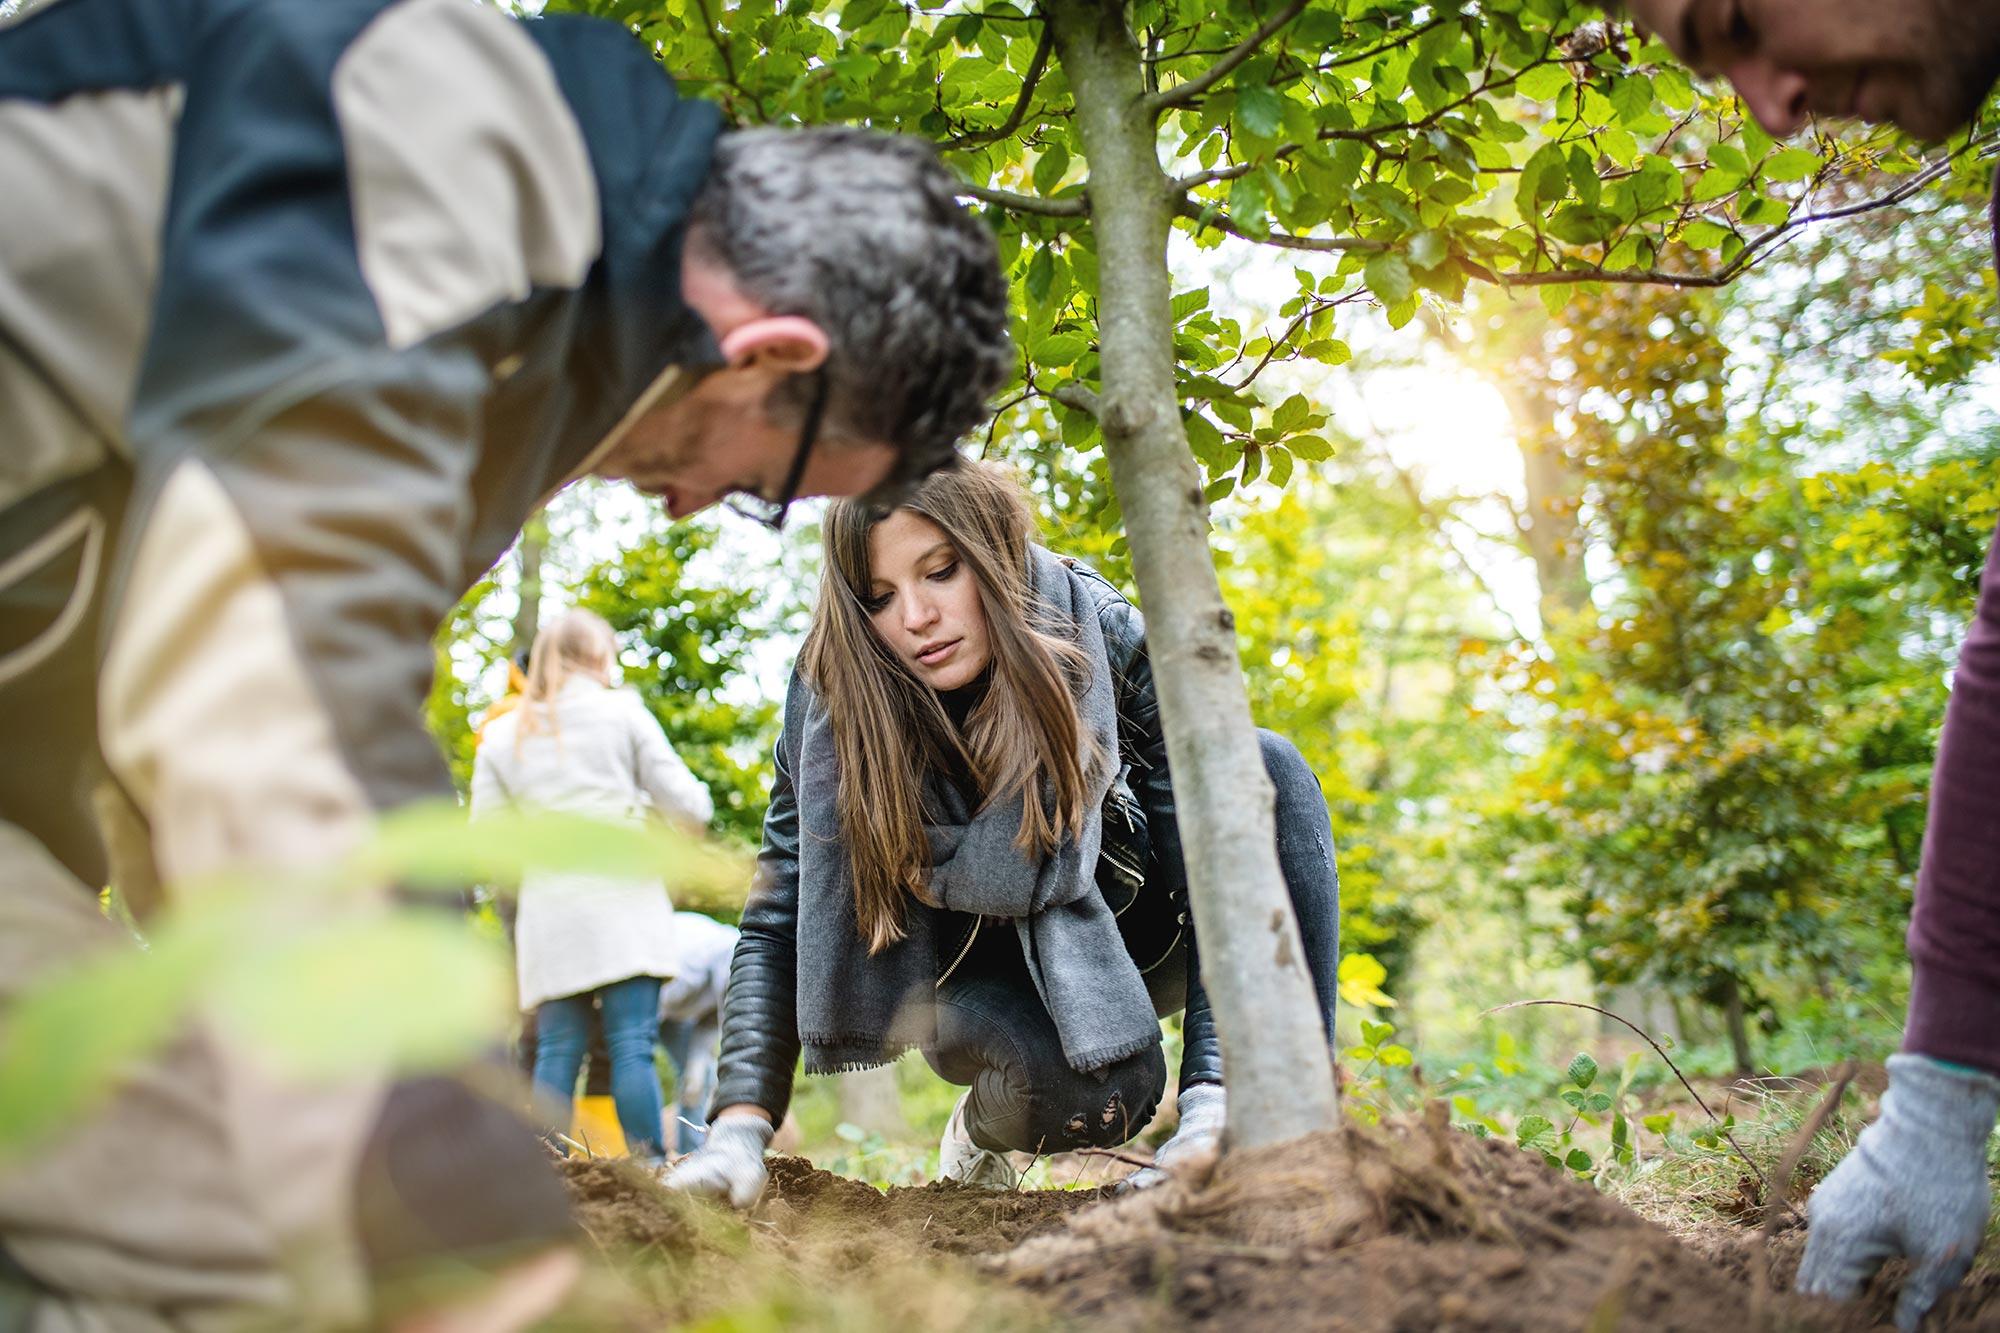 Santiago Advisors Beratungsagentur Imagemotive Baumpflanzen im Wald Project Zero Natur Frau konzentriert